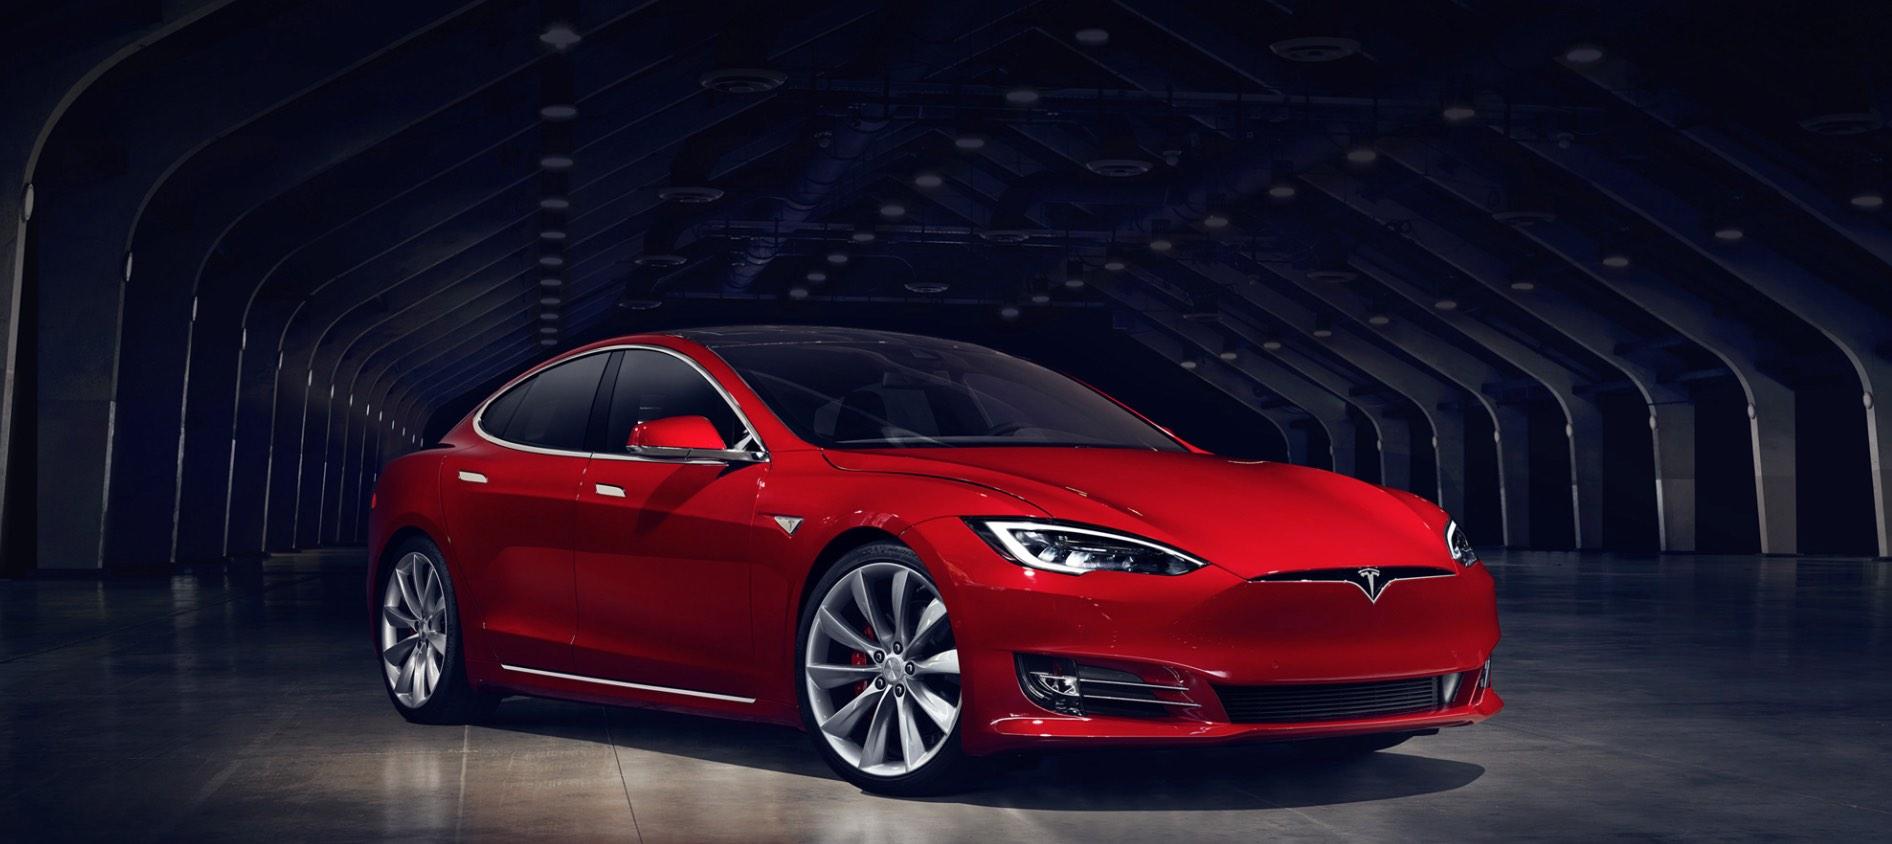 Preiserhöhung: So sieht der neue Tesla Model S aus - Tesla Model S Facelift 2016 (Bild: Tesla Motors)